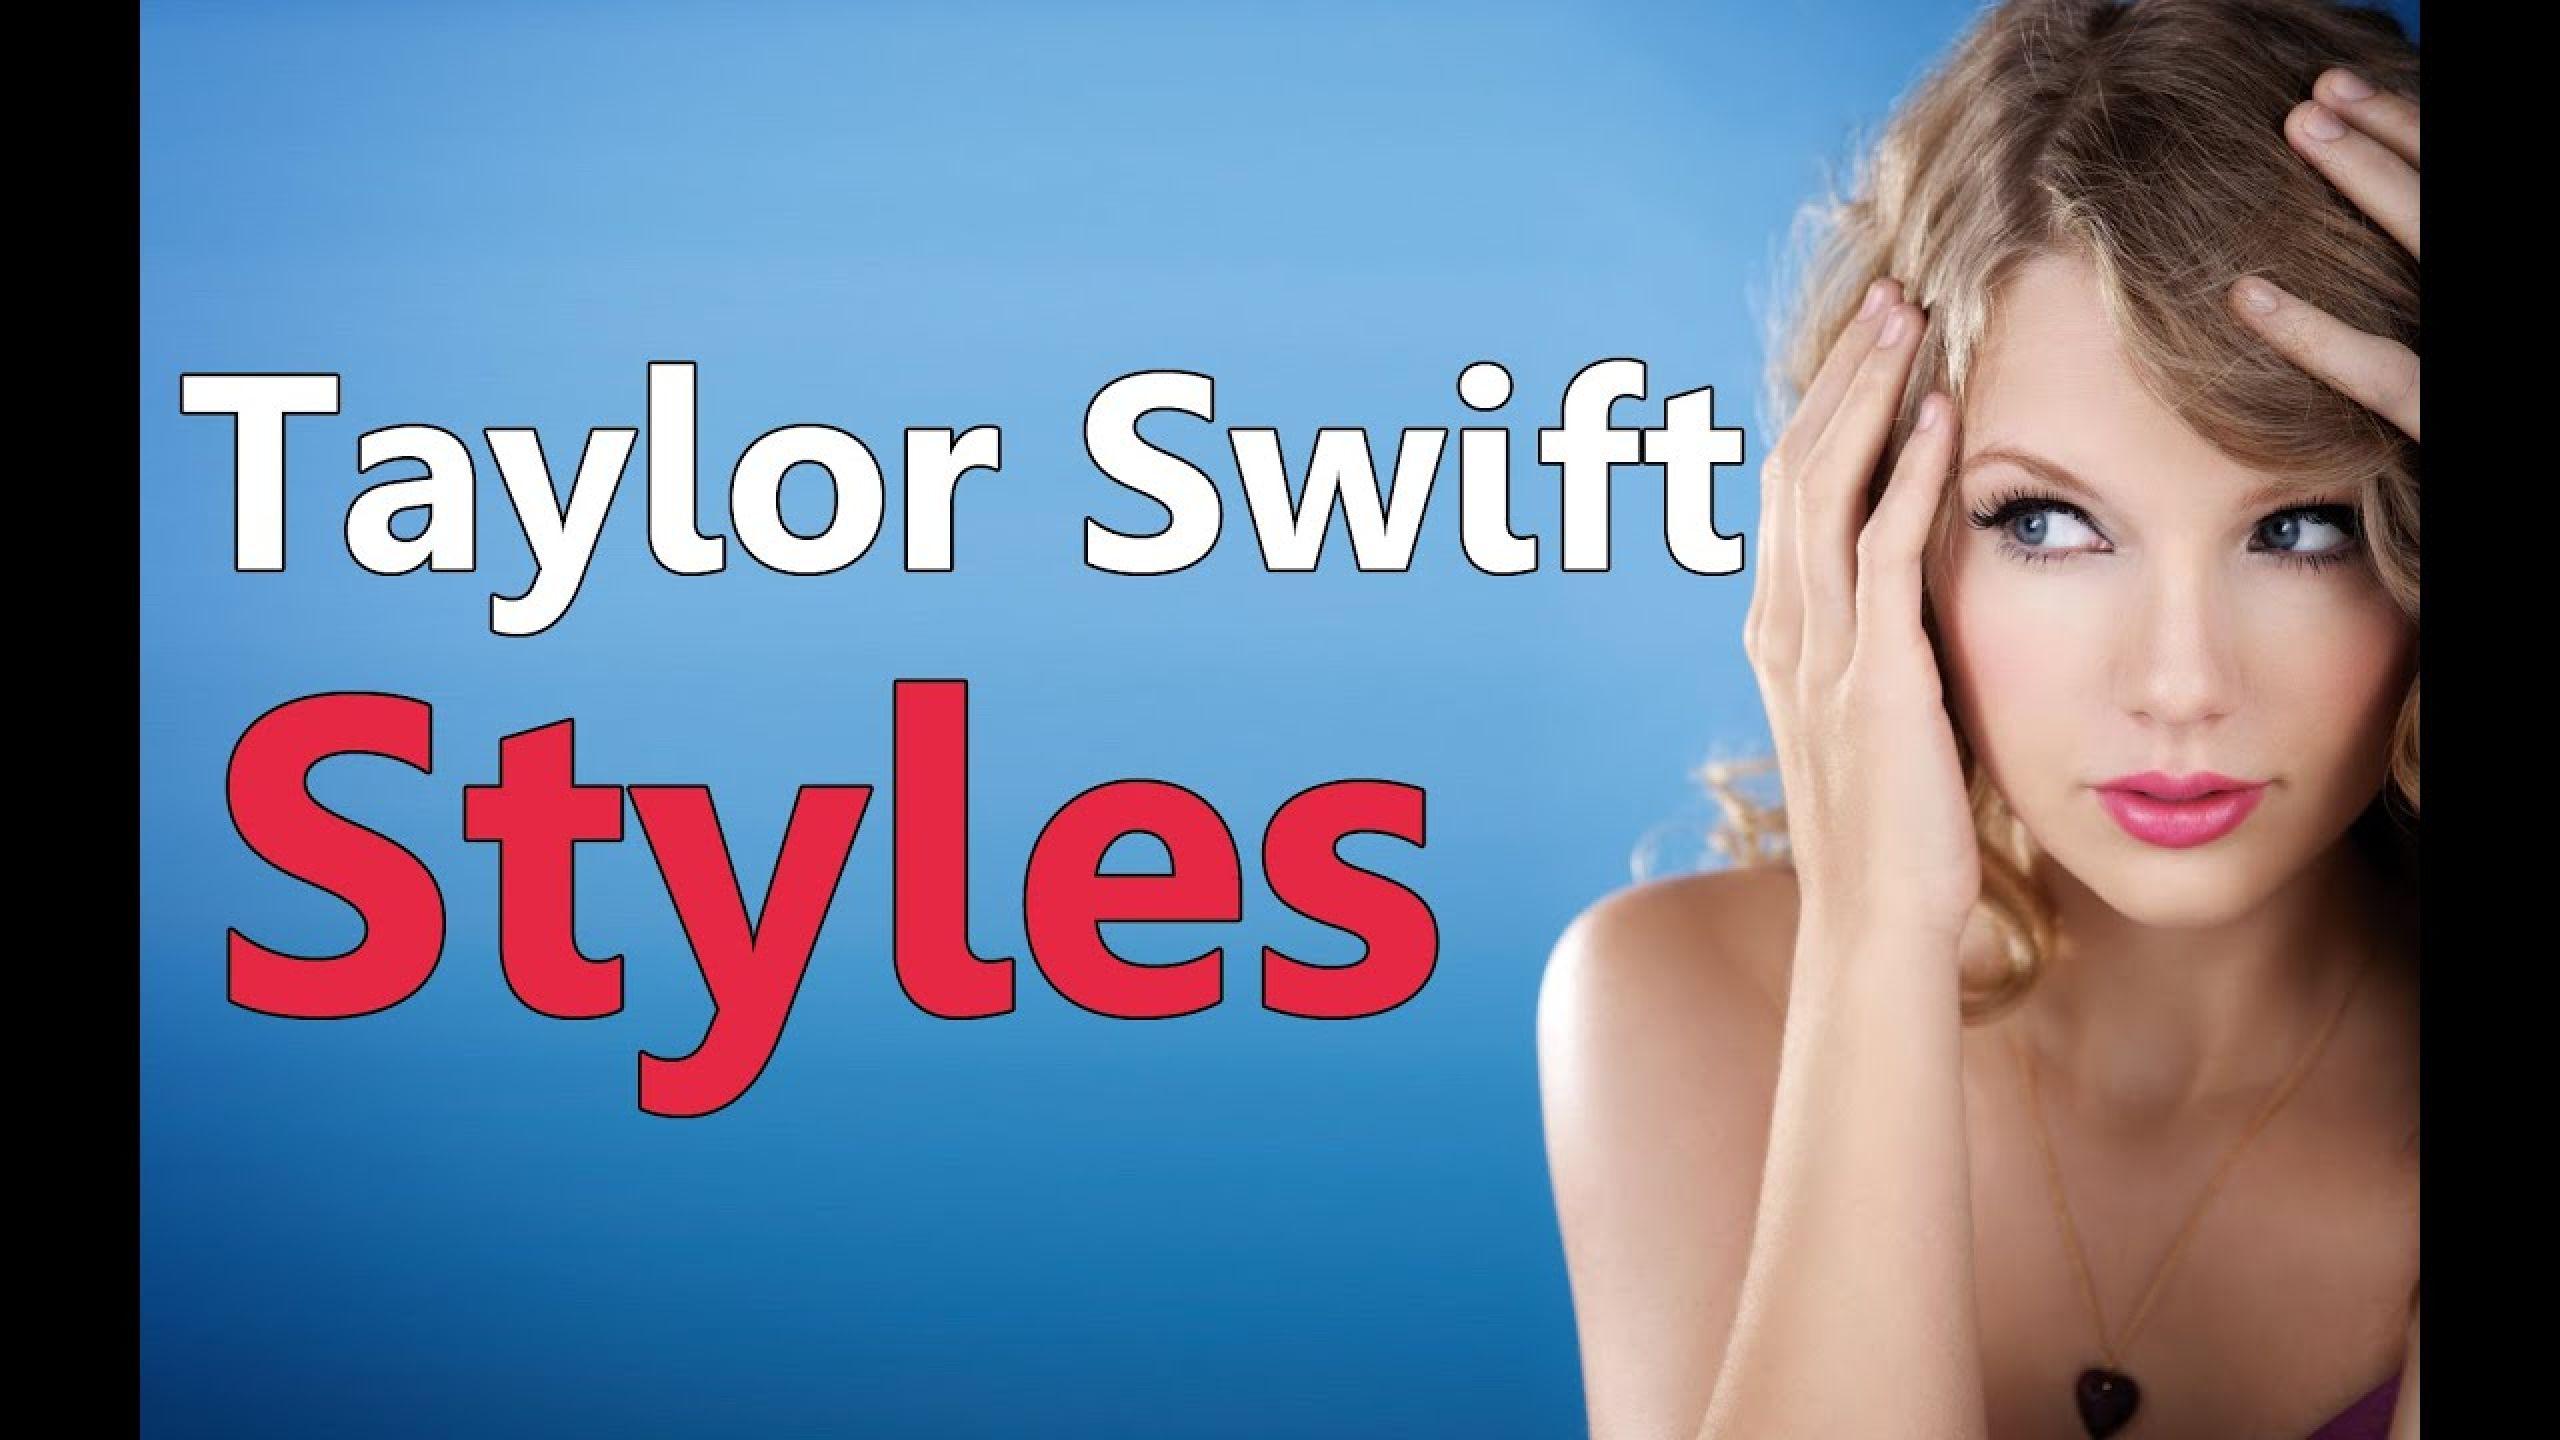 Taylor Swift Styles Street Fashion Cool Styles Looks